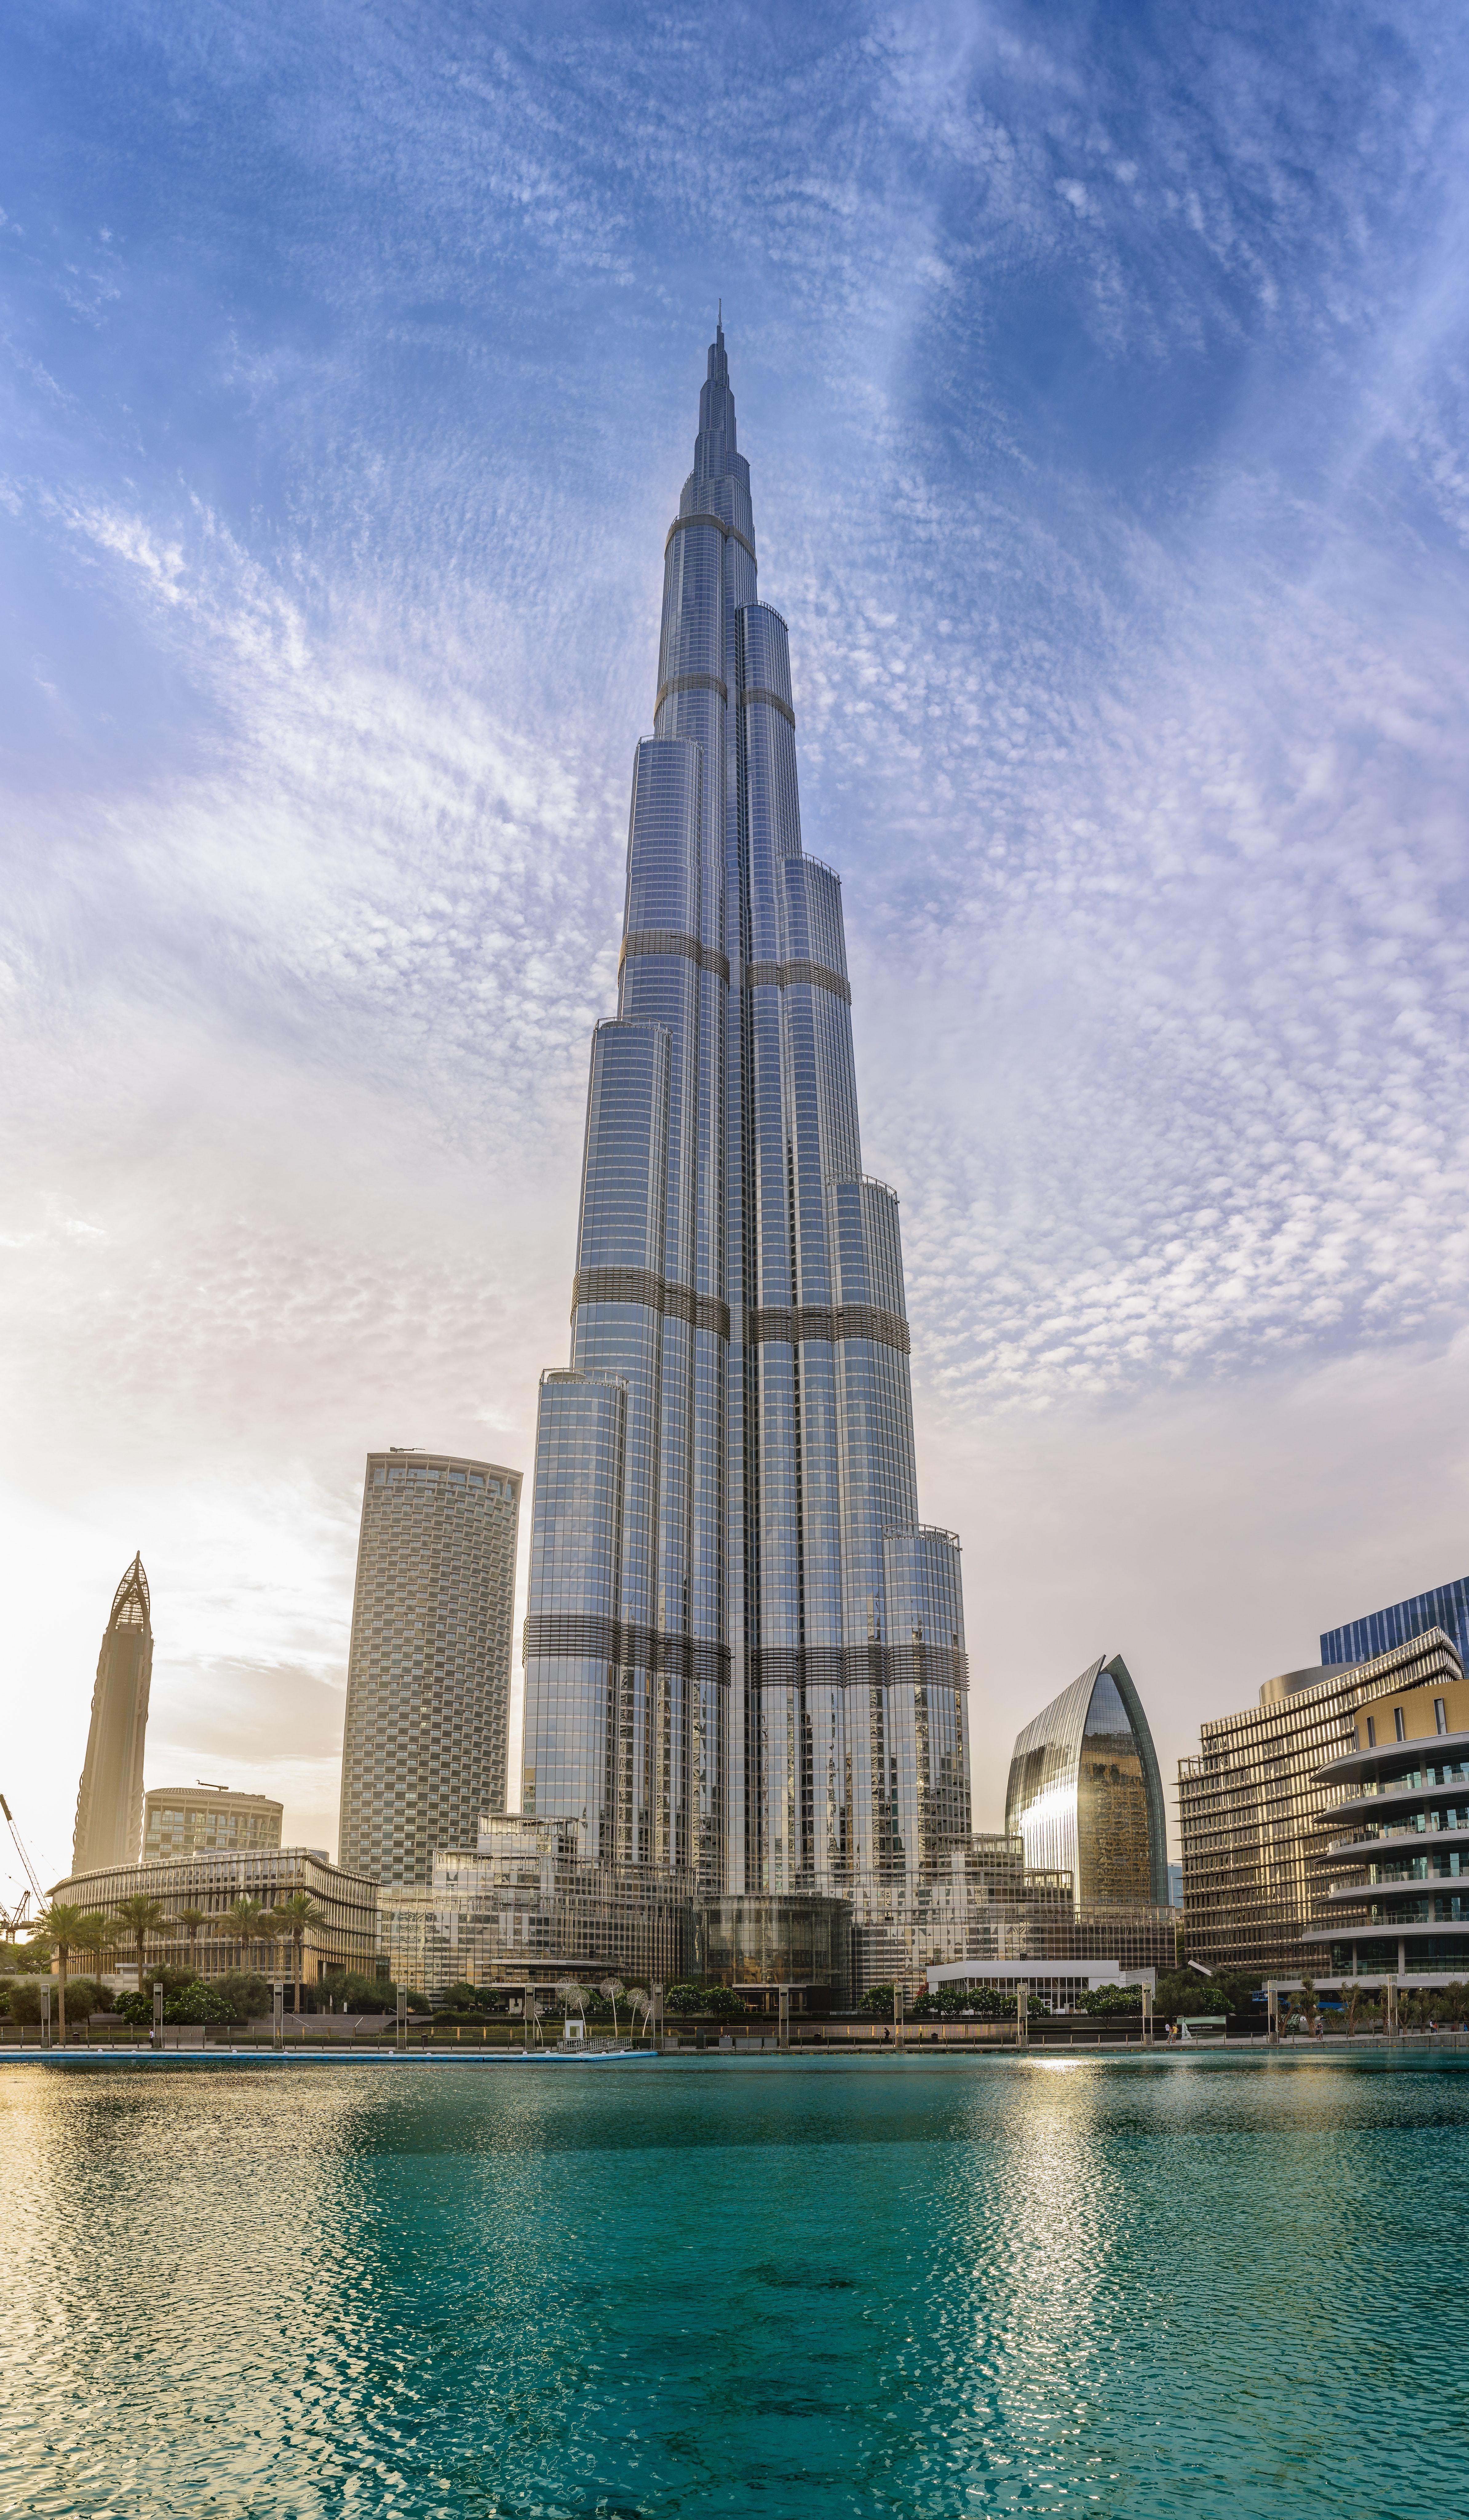 Burj khalifa hd wallpaper - Dubai burj khalifa hd photos ...